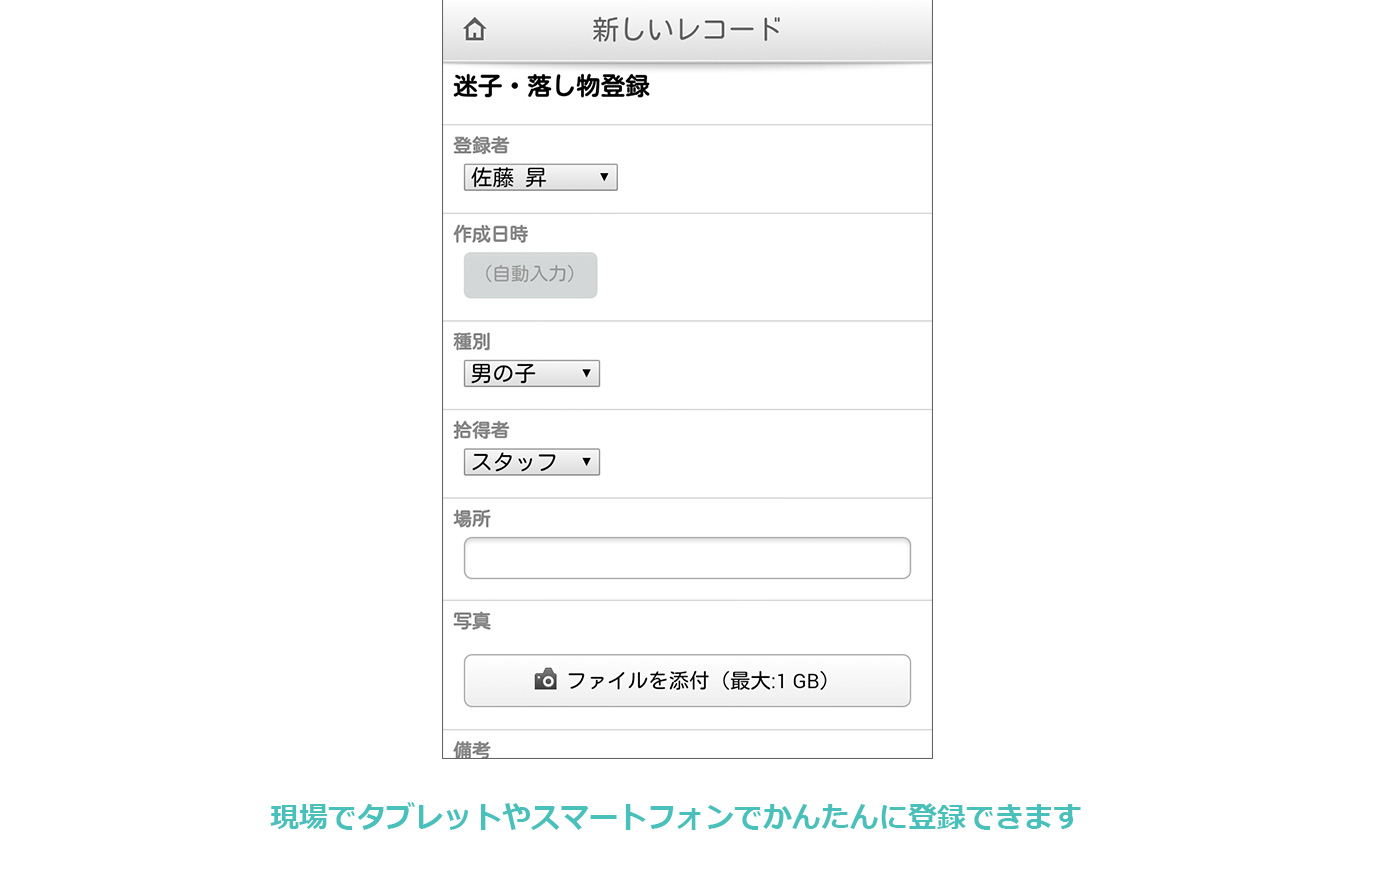 ktp_33_3_web.jpg